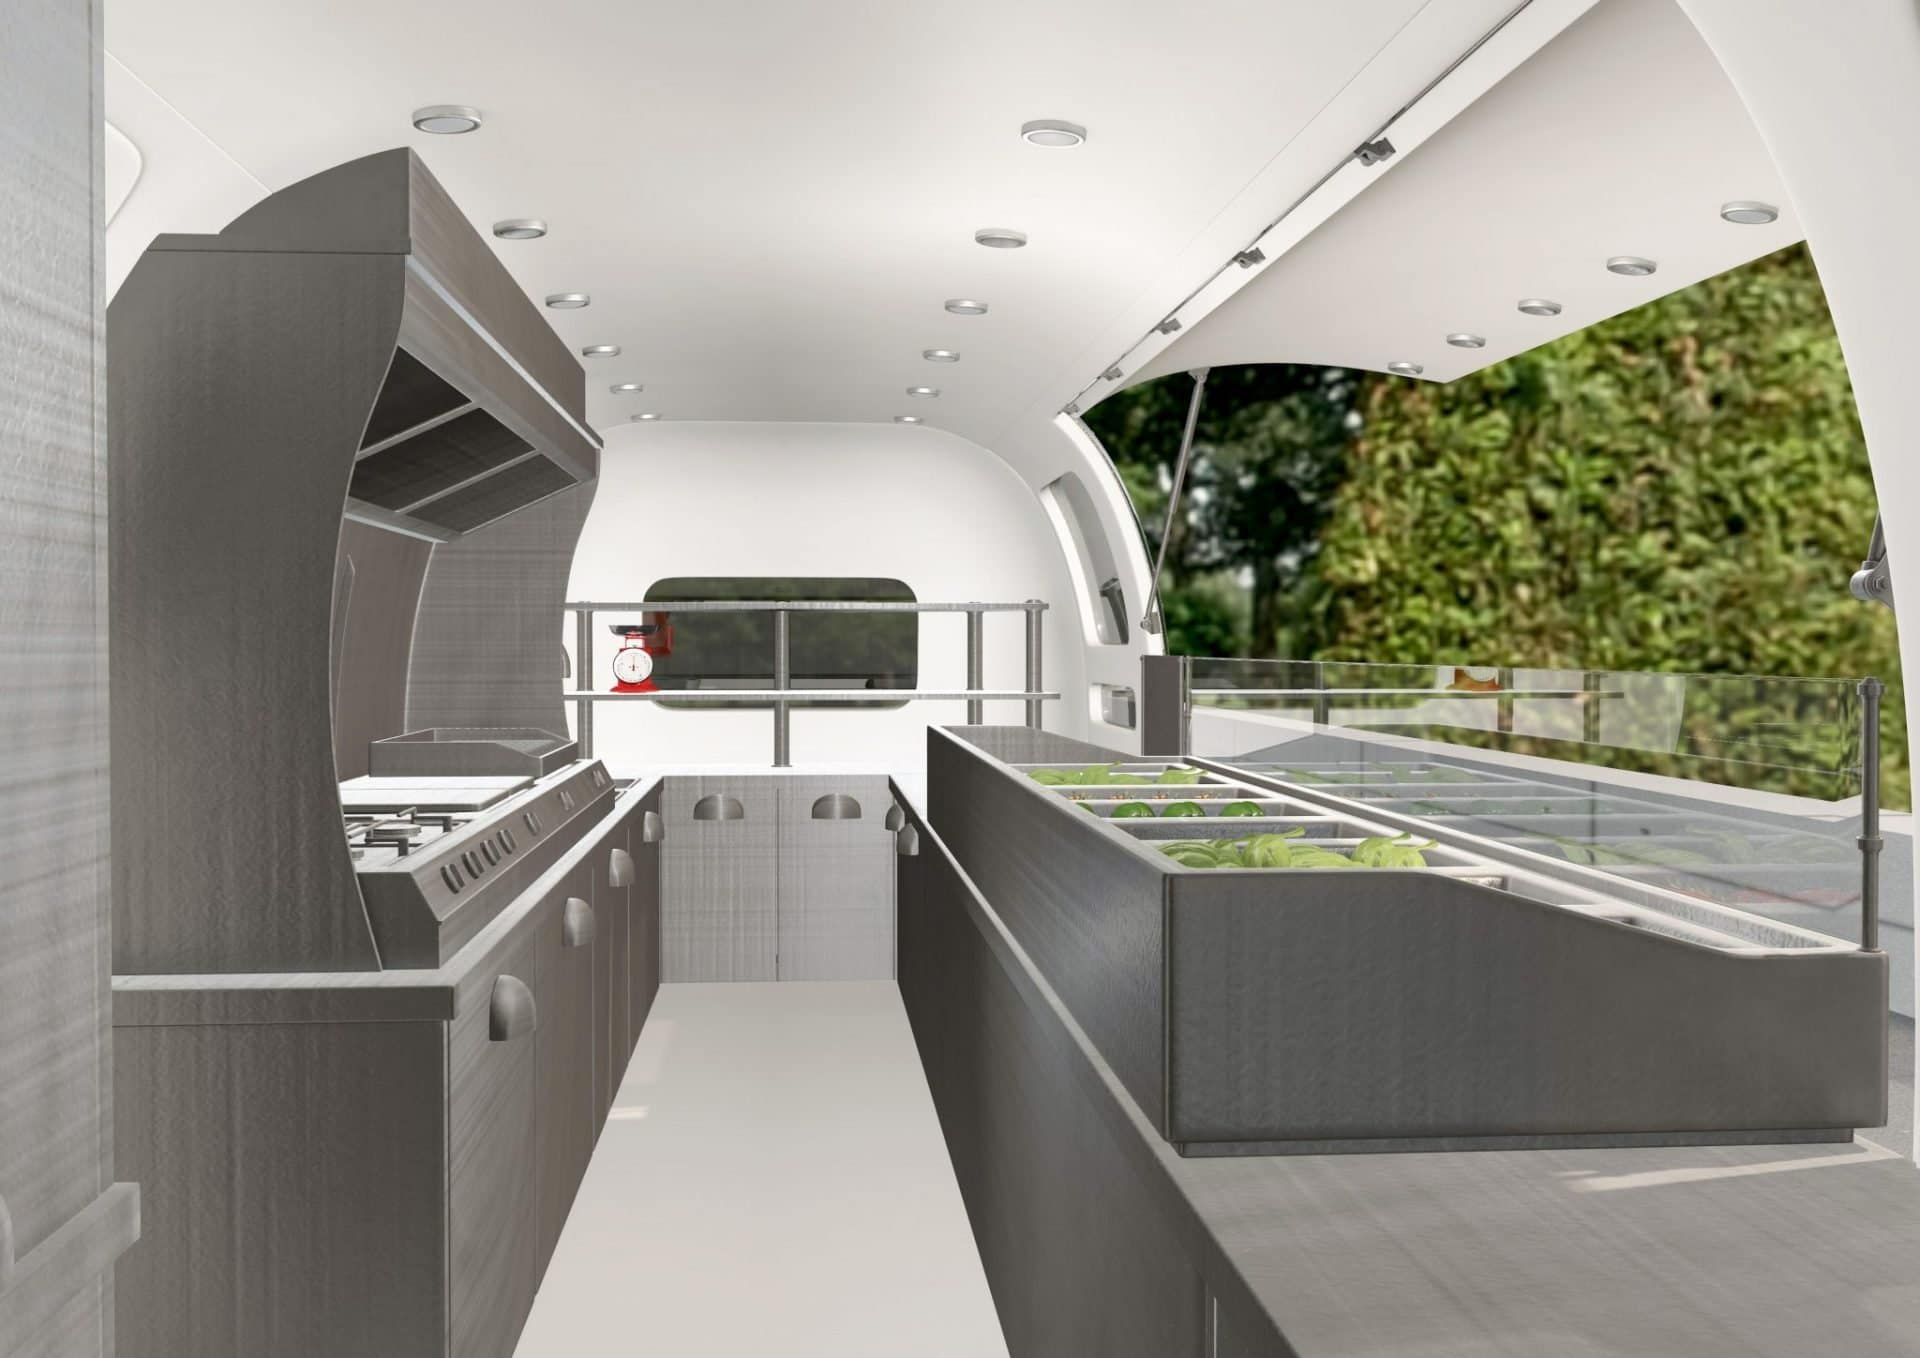 Airstream-Foodtrailer-Foodtruck-Gastro-Küche_2